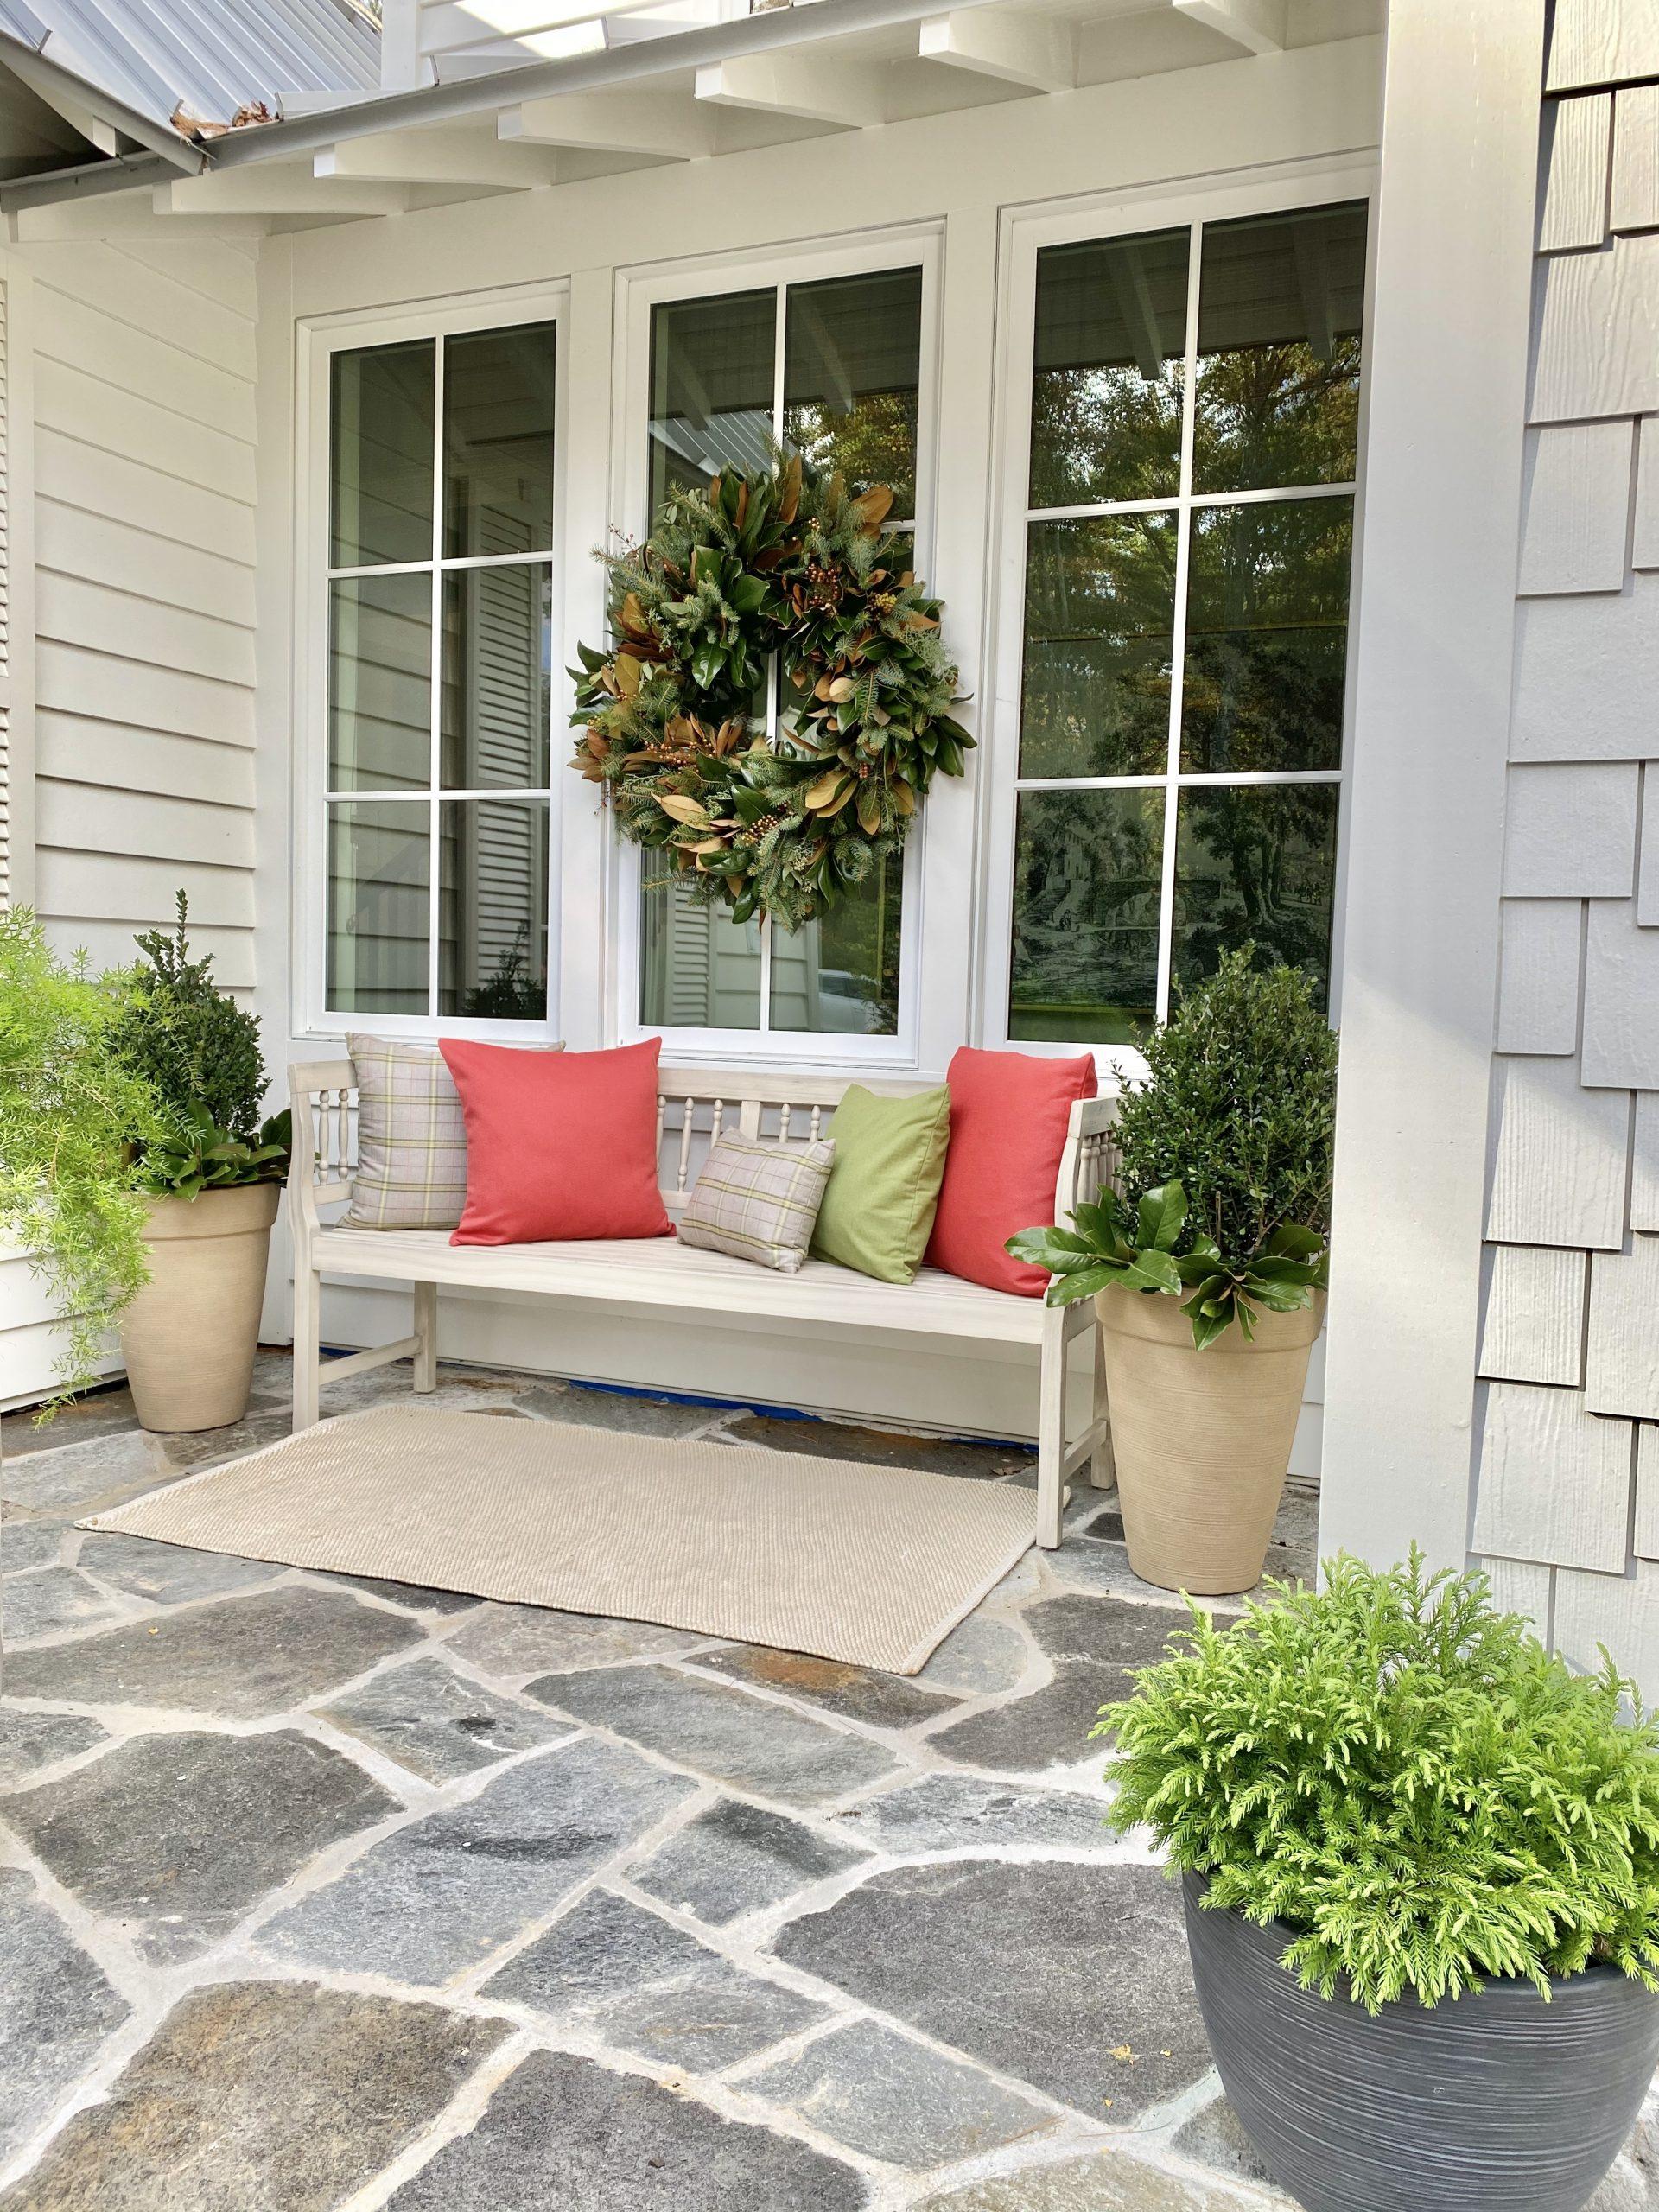 Sunbrella-Fabrics-Front-Porch-Holiday-Styling